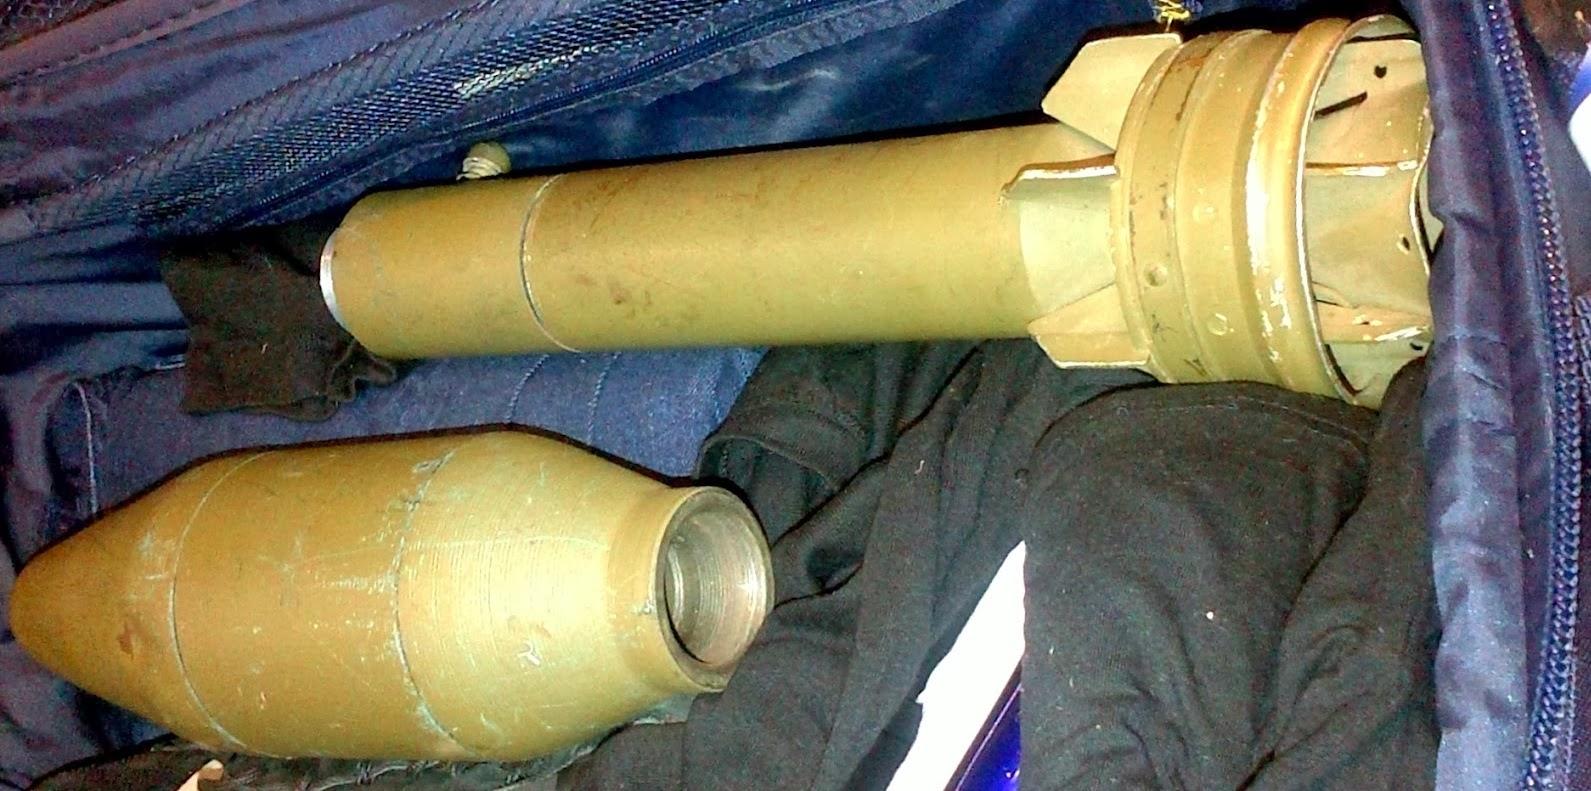 Inert Bazooka Round (ORD)